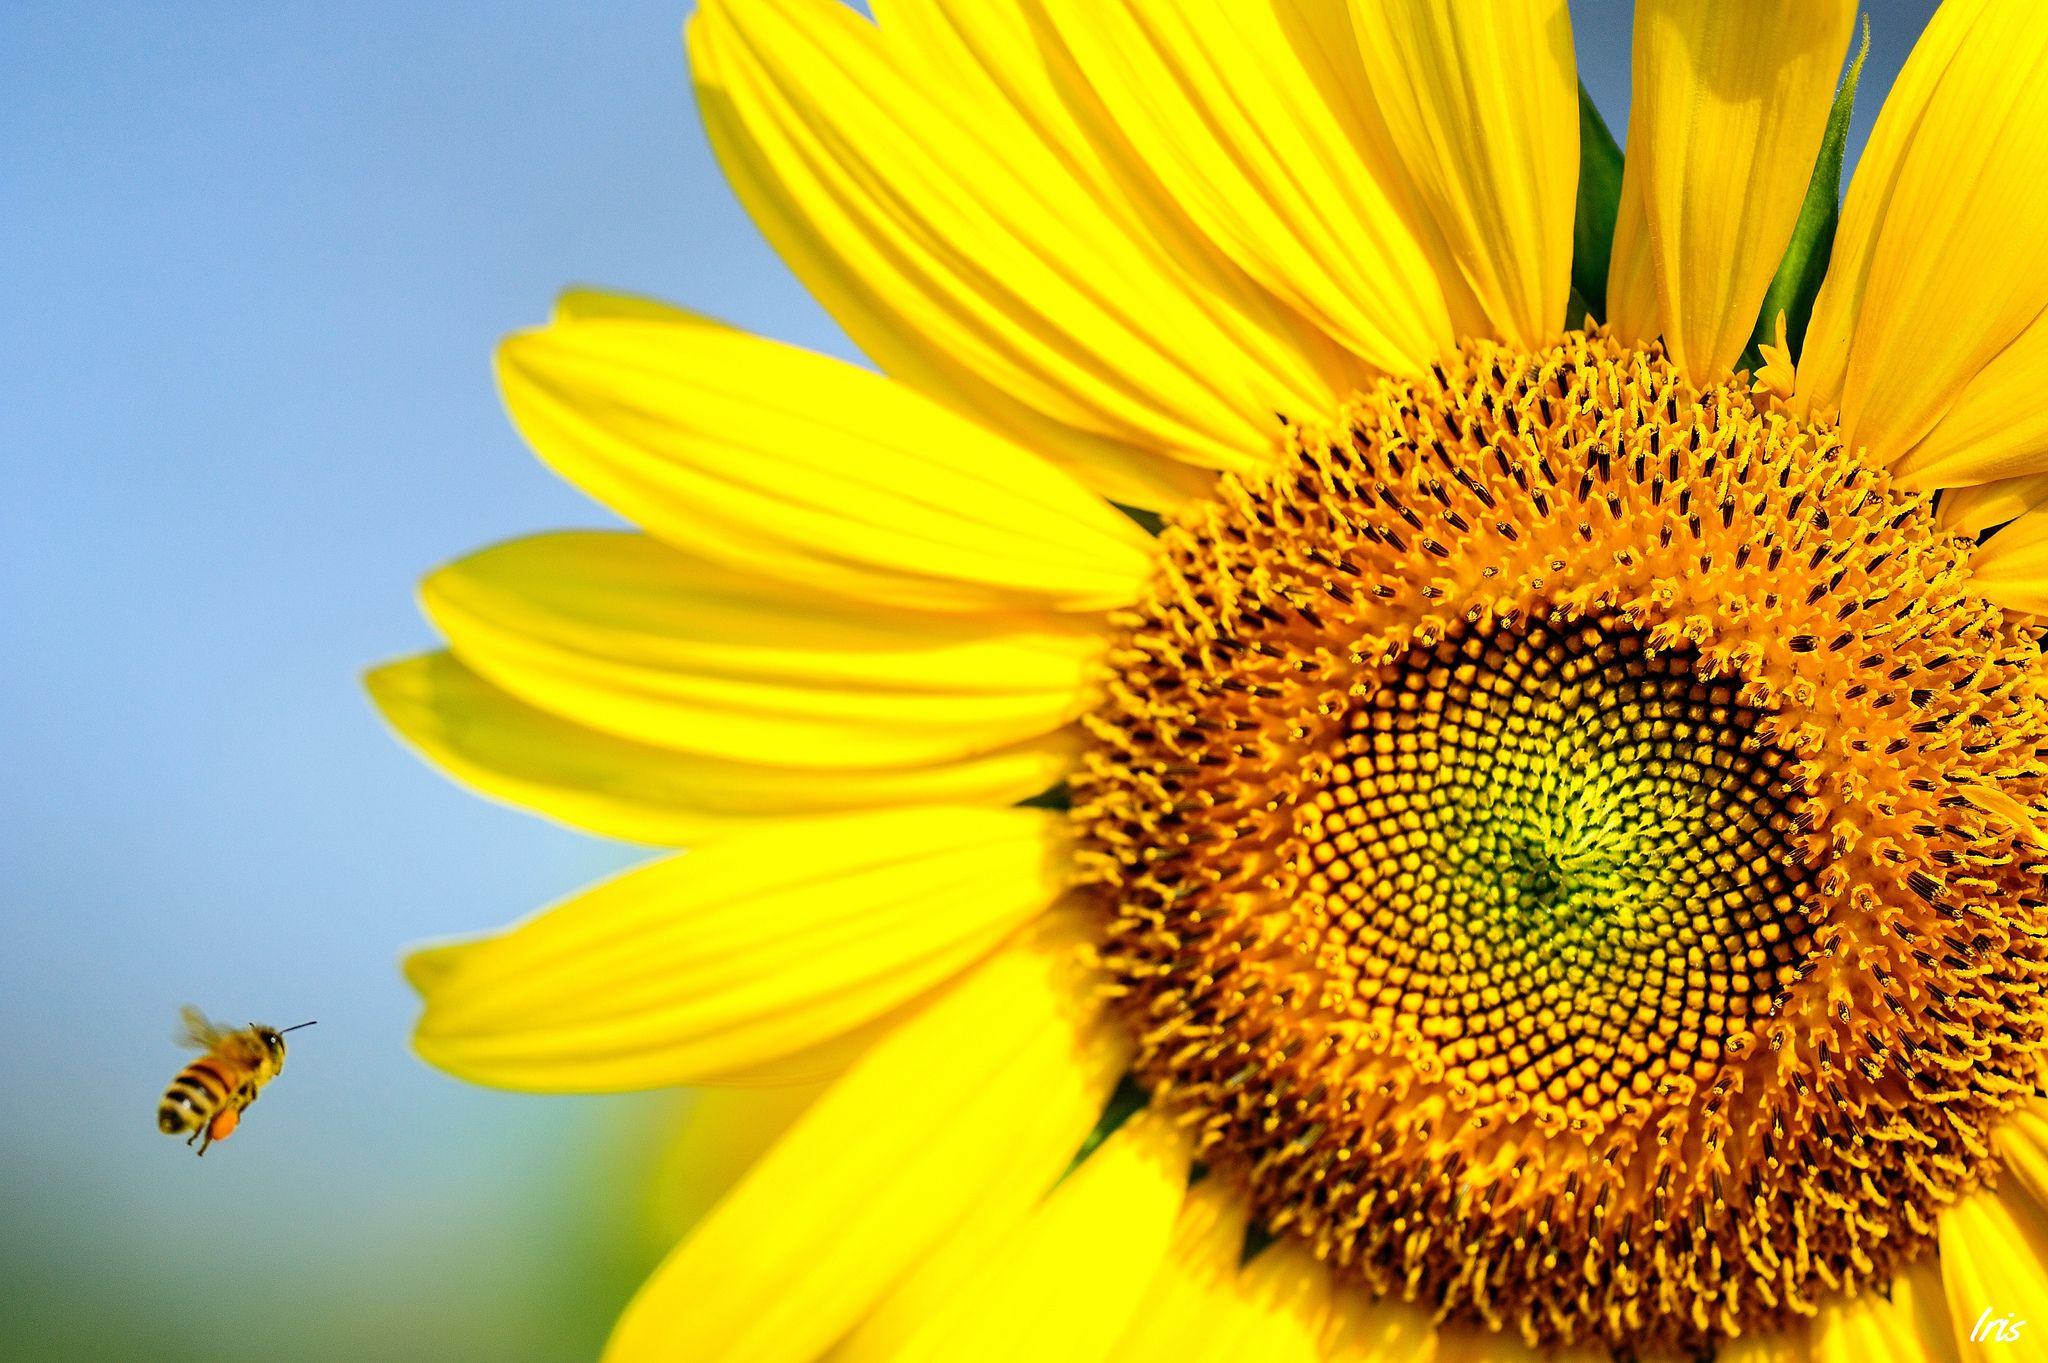 Sunflower Bee wallpapers HD free 325648 Sunflower